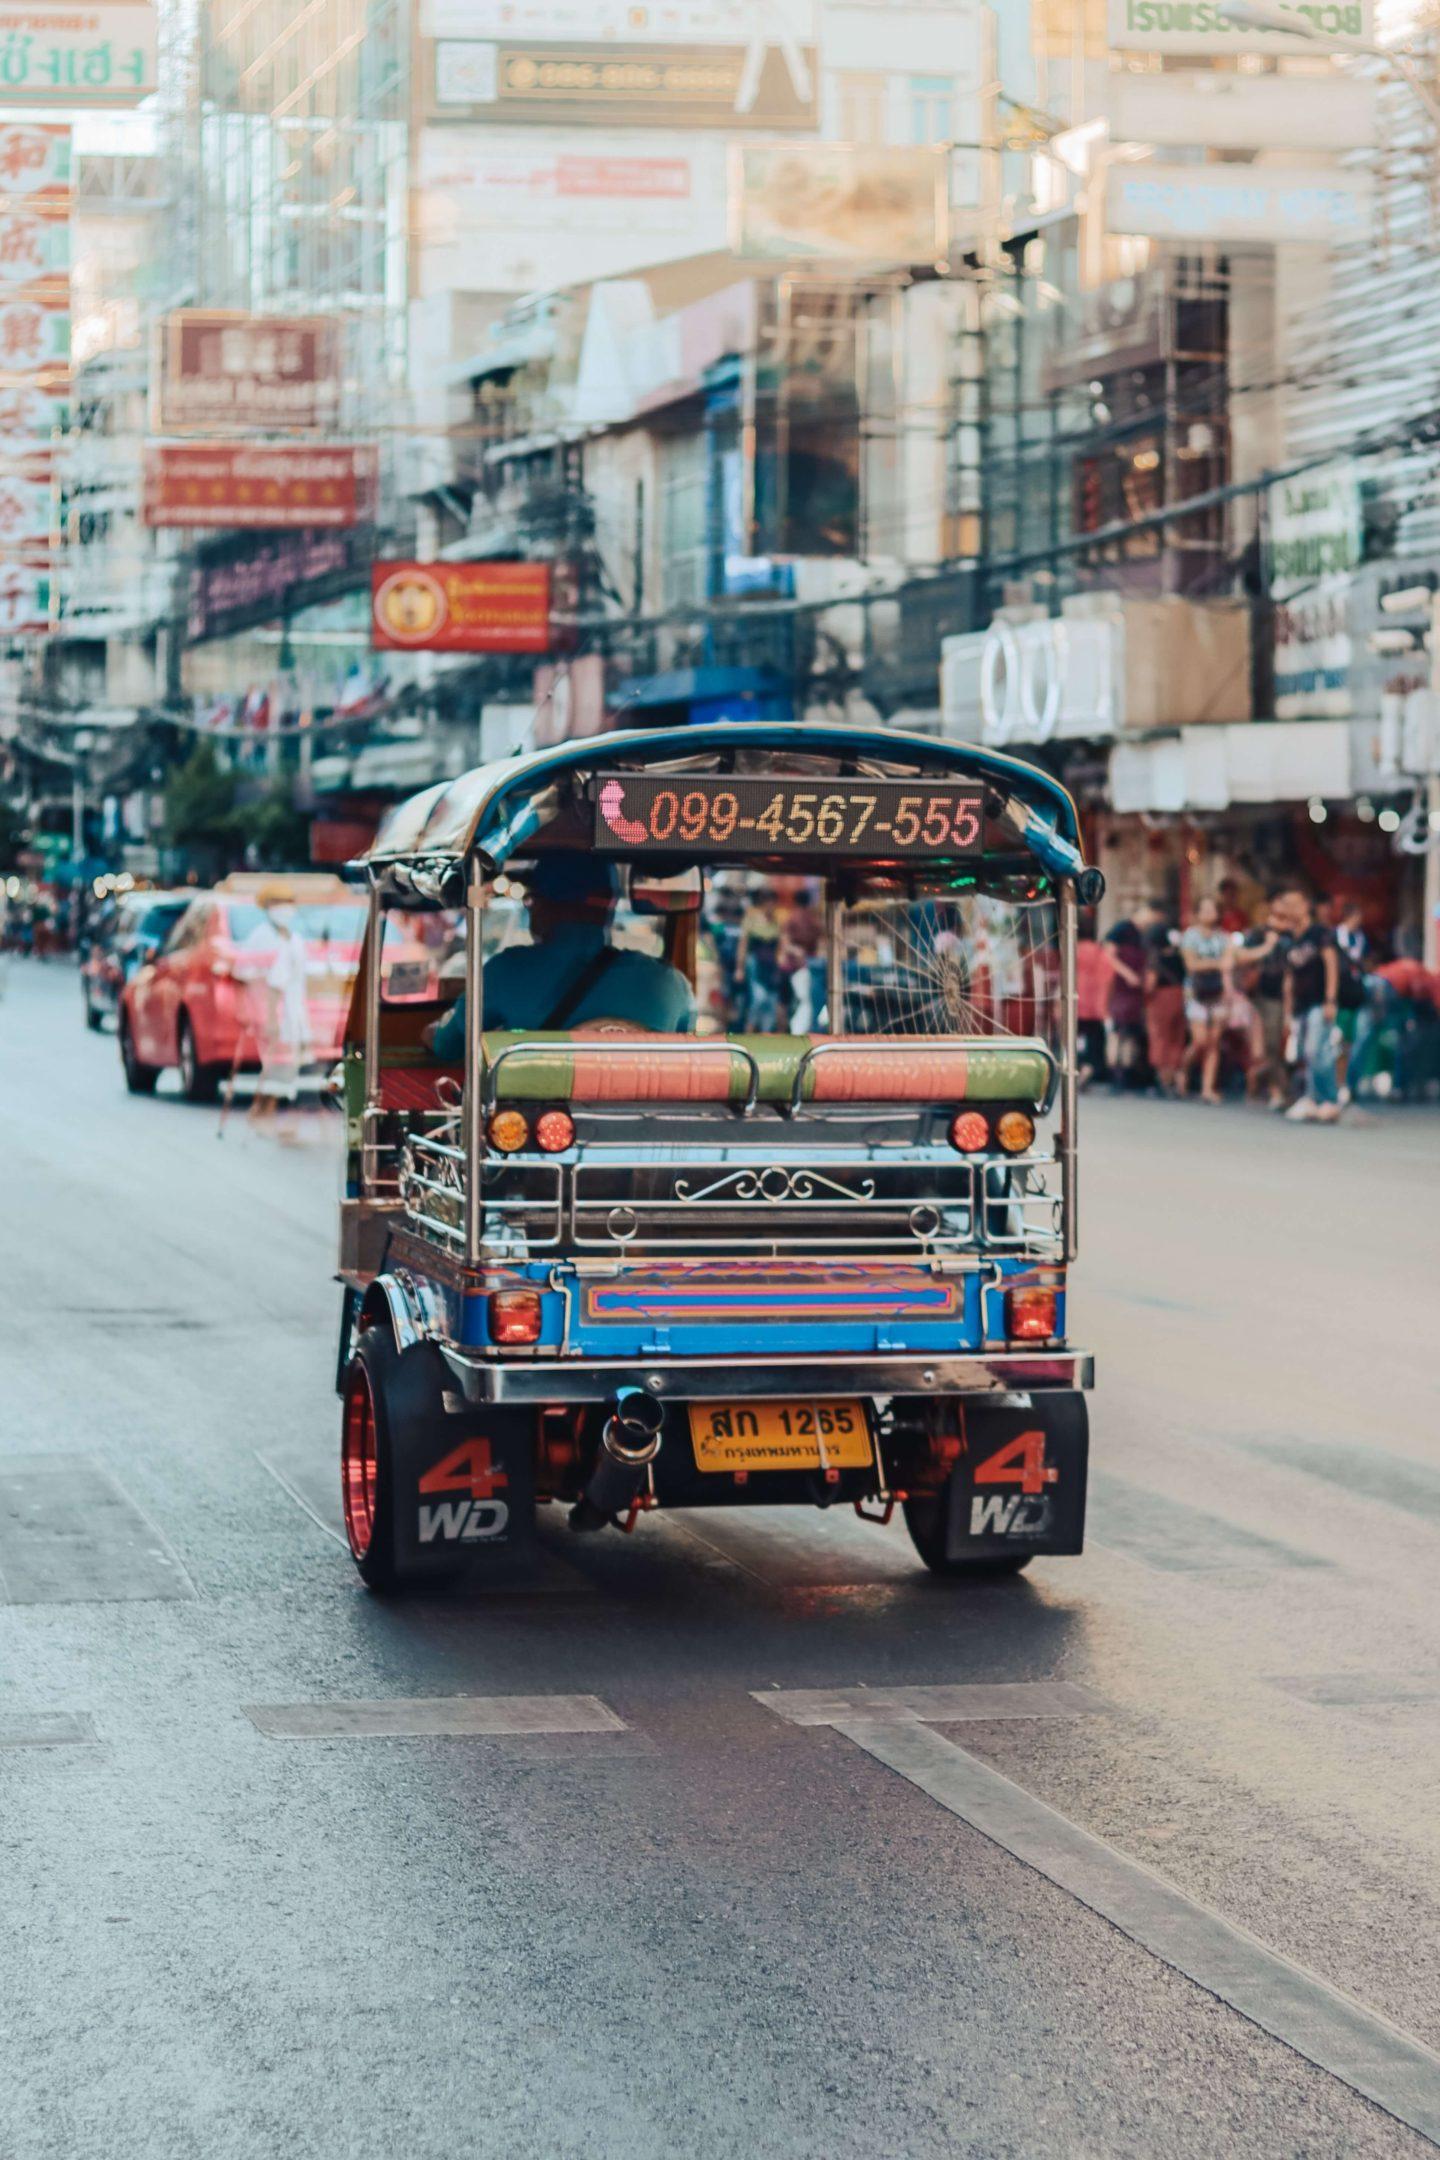 10 days in thailand - tuk tuk driving around thailand